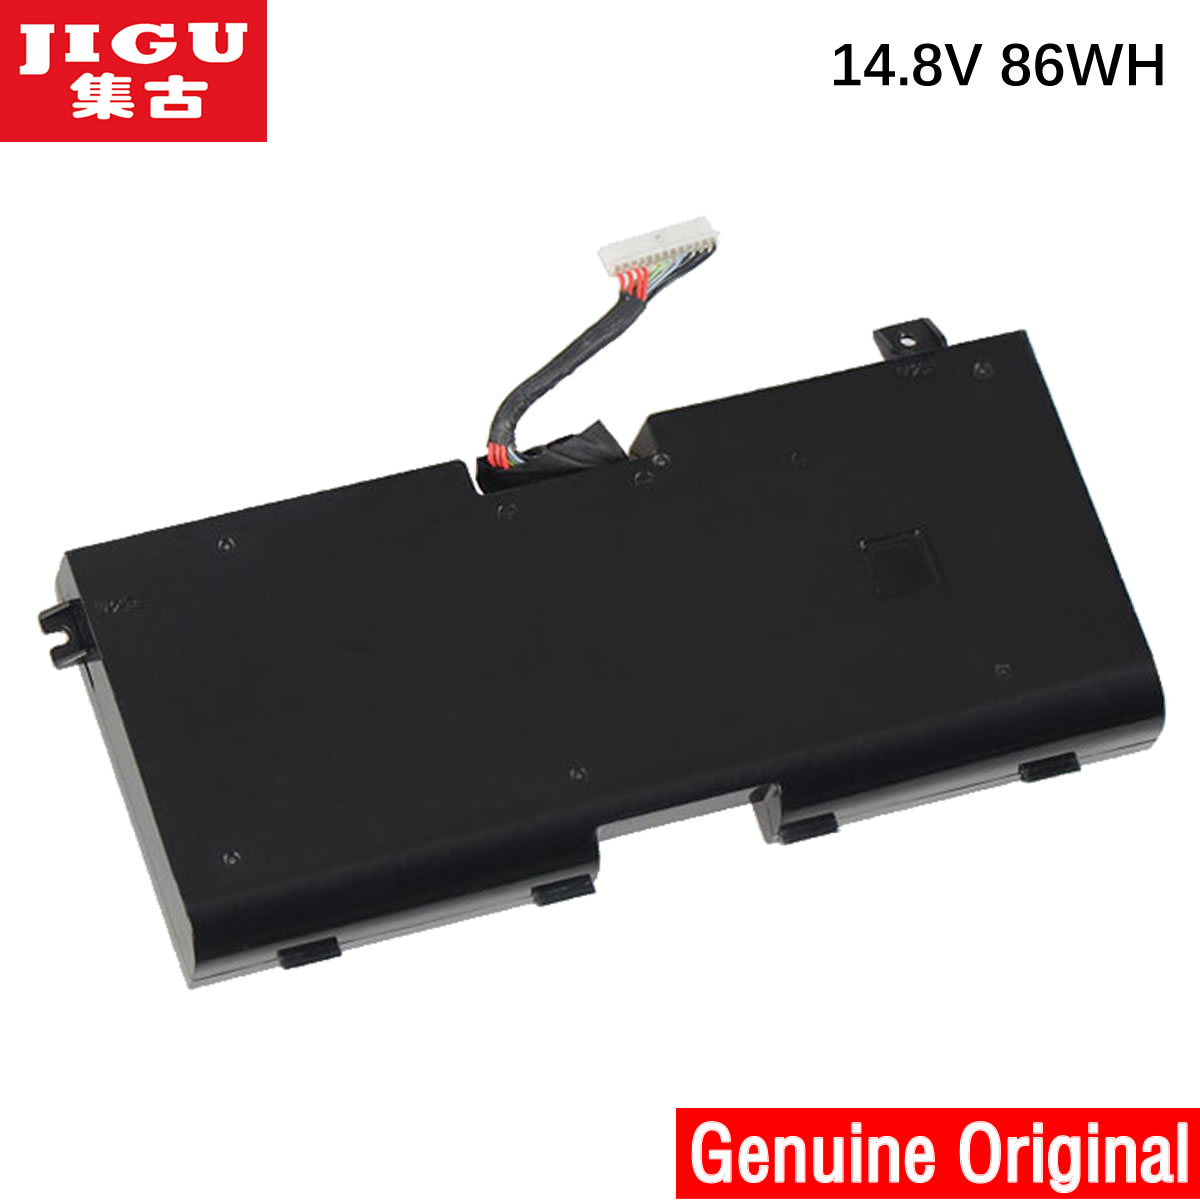 Aliexpress.com : Buy JIGU Original laptop Battery 2F8K3